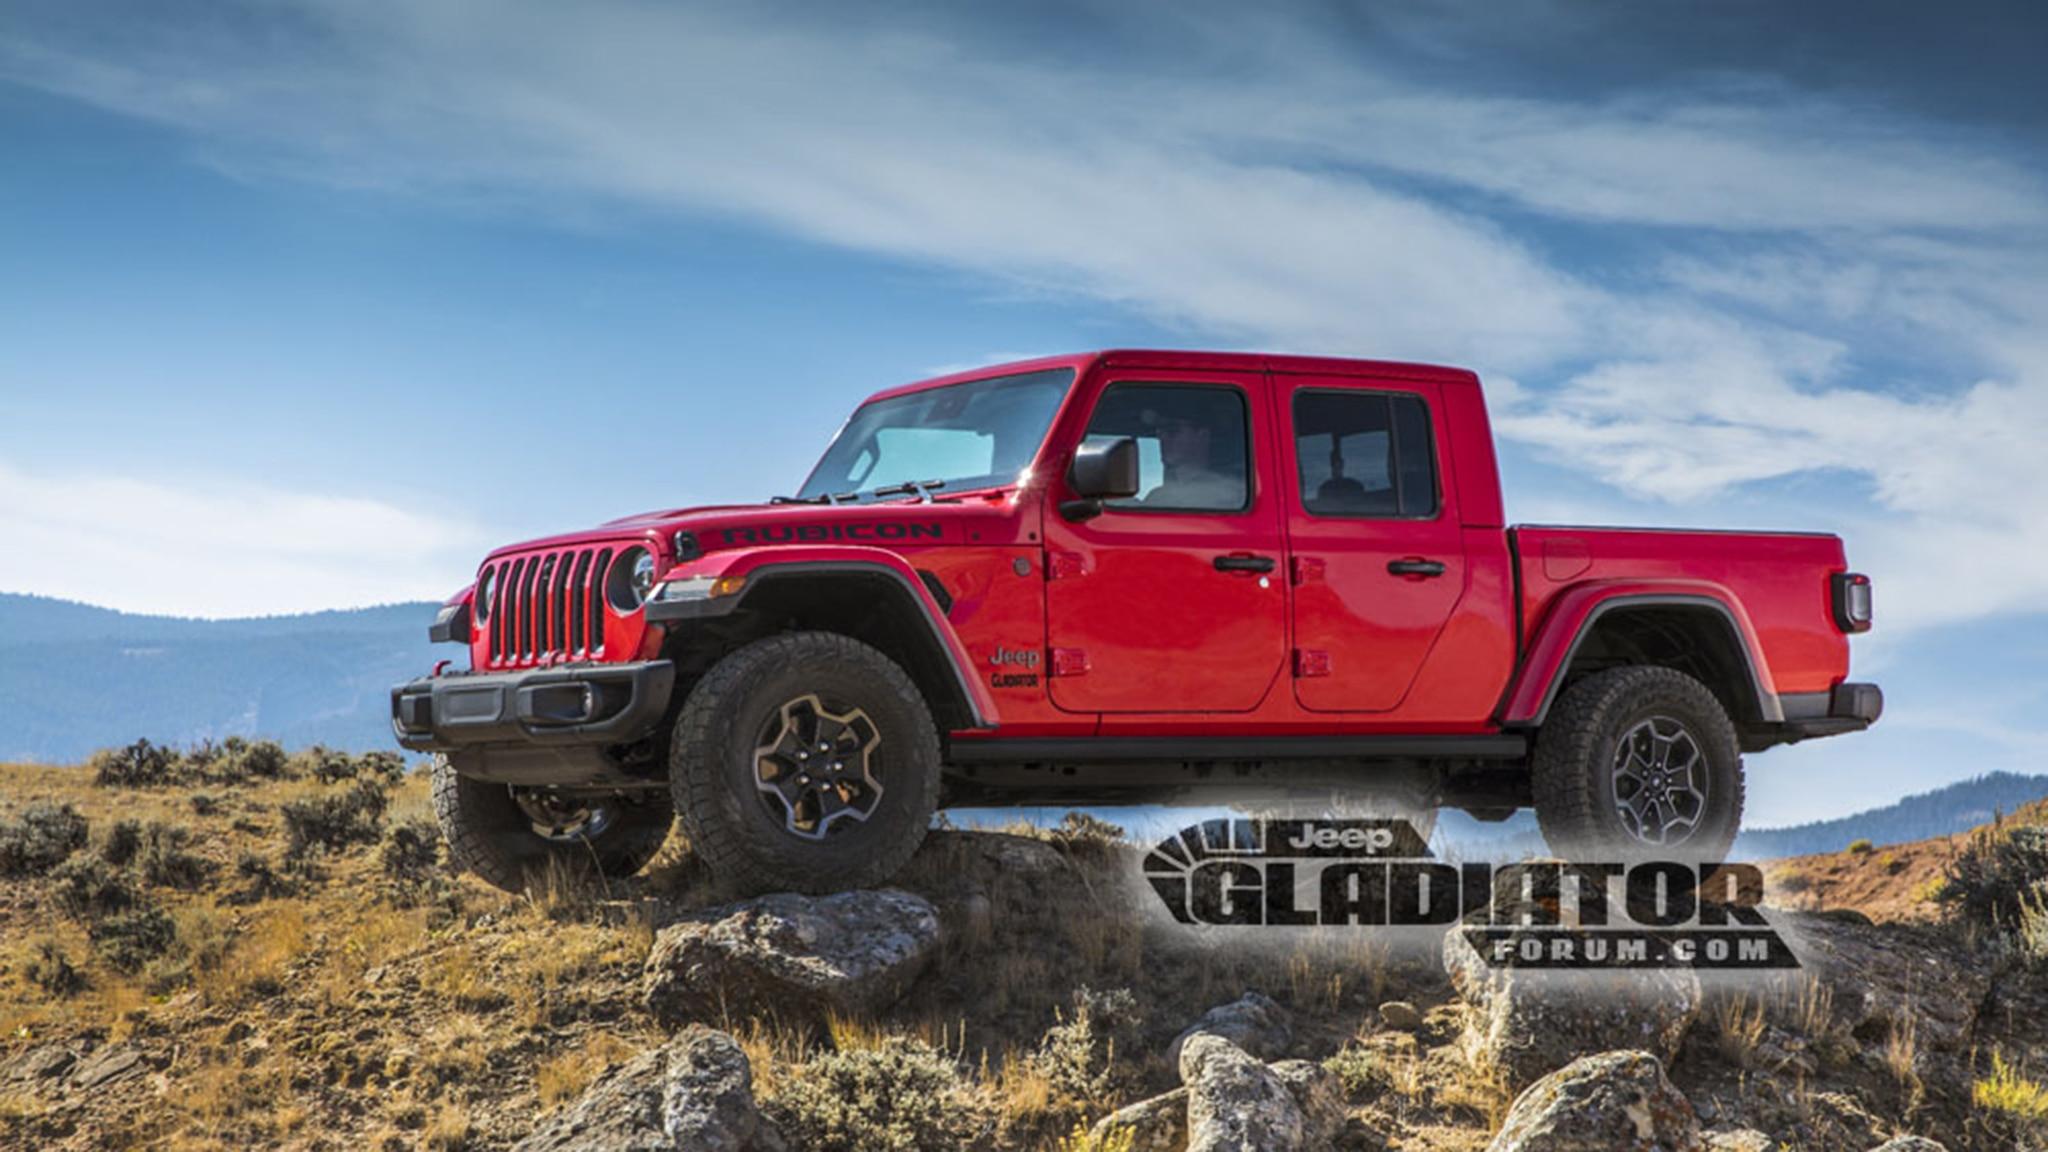 Jeep Gladiator Pickup Truck Photos Leak Online ...